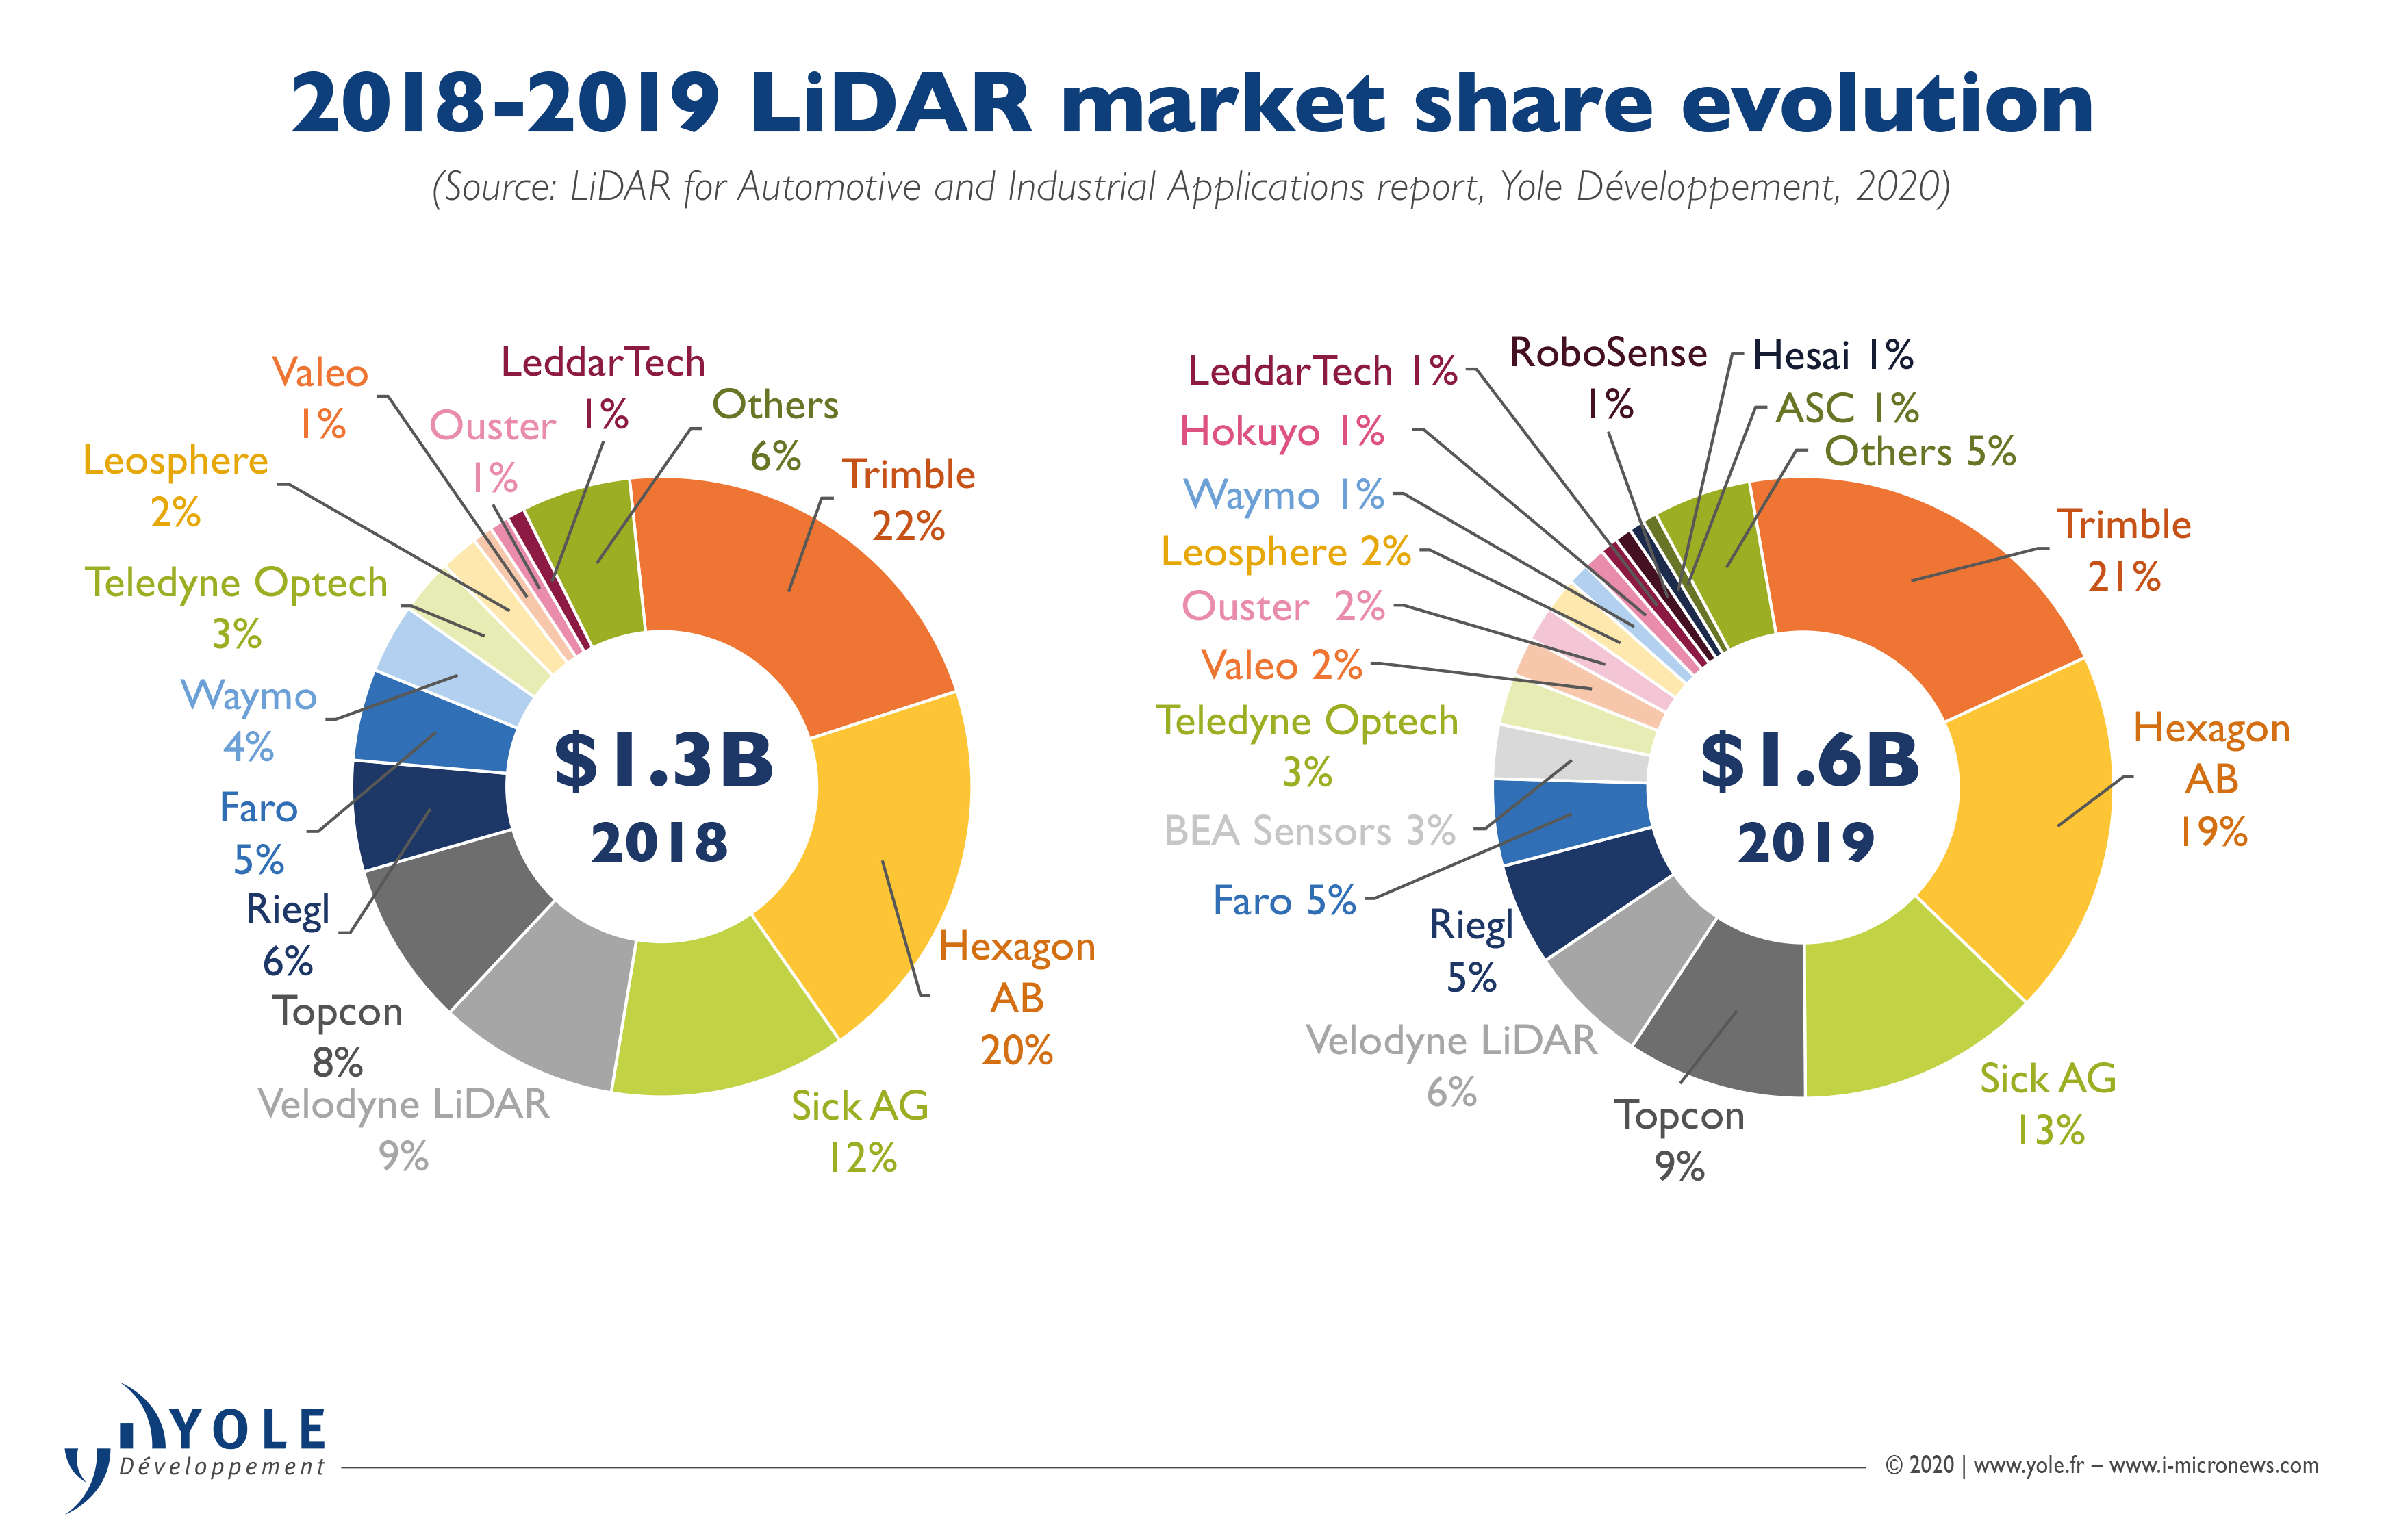 ILLUS_LiDAR_MARKET_UPDATE_2018-2019_LiDARmarketShareEvolution_YoleGroup_August2020